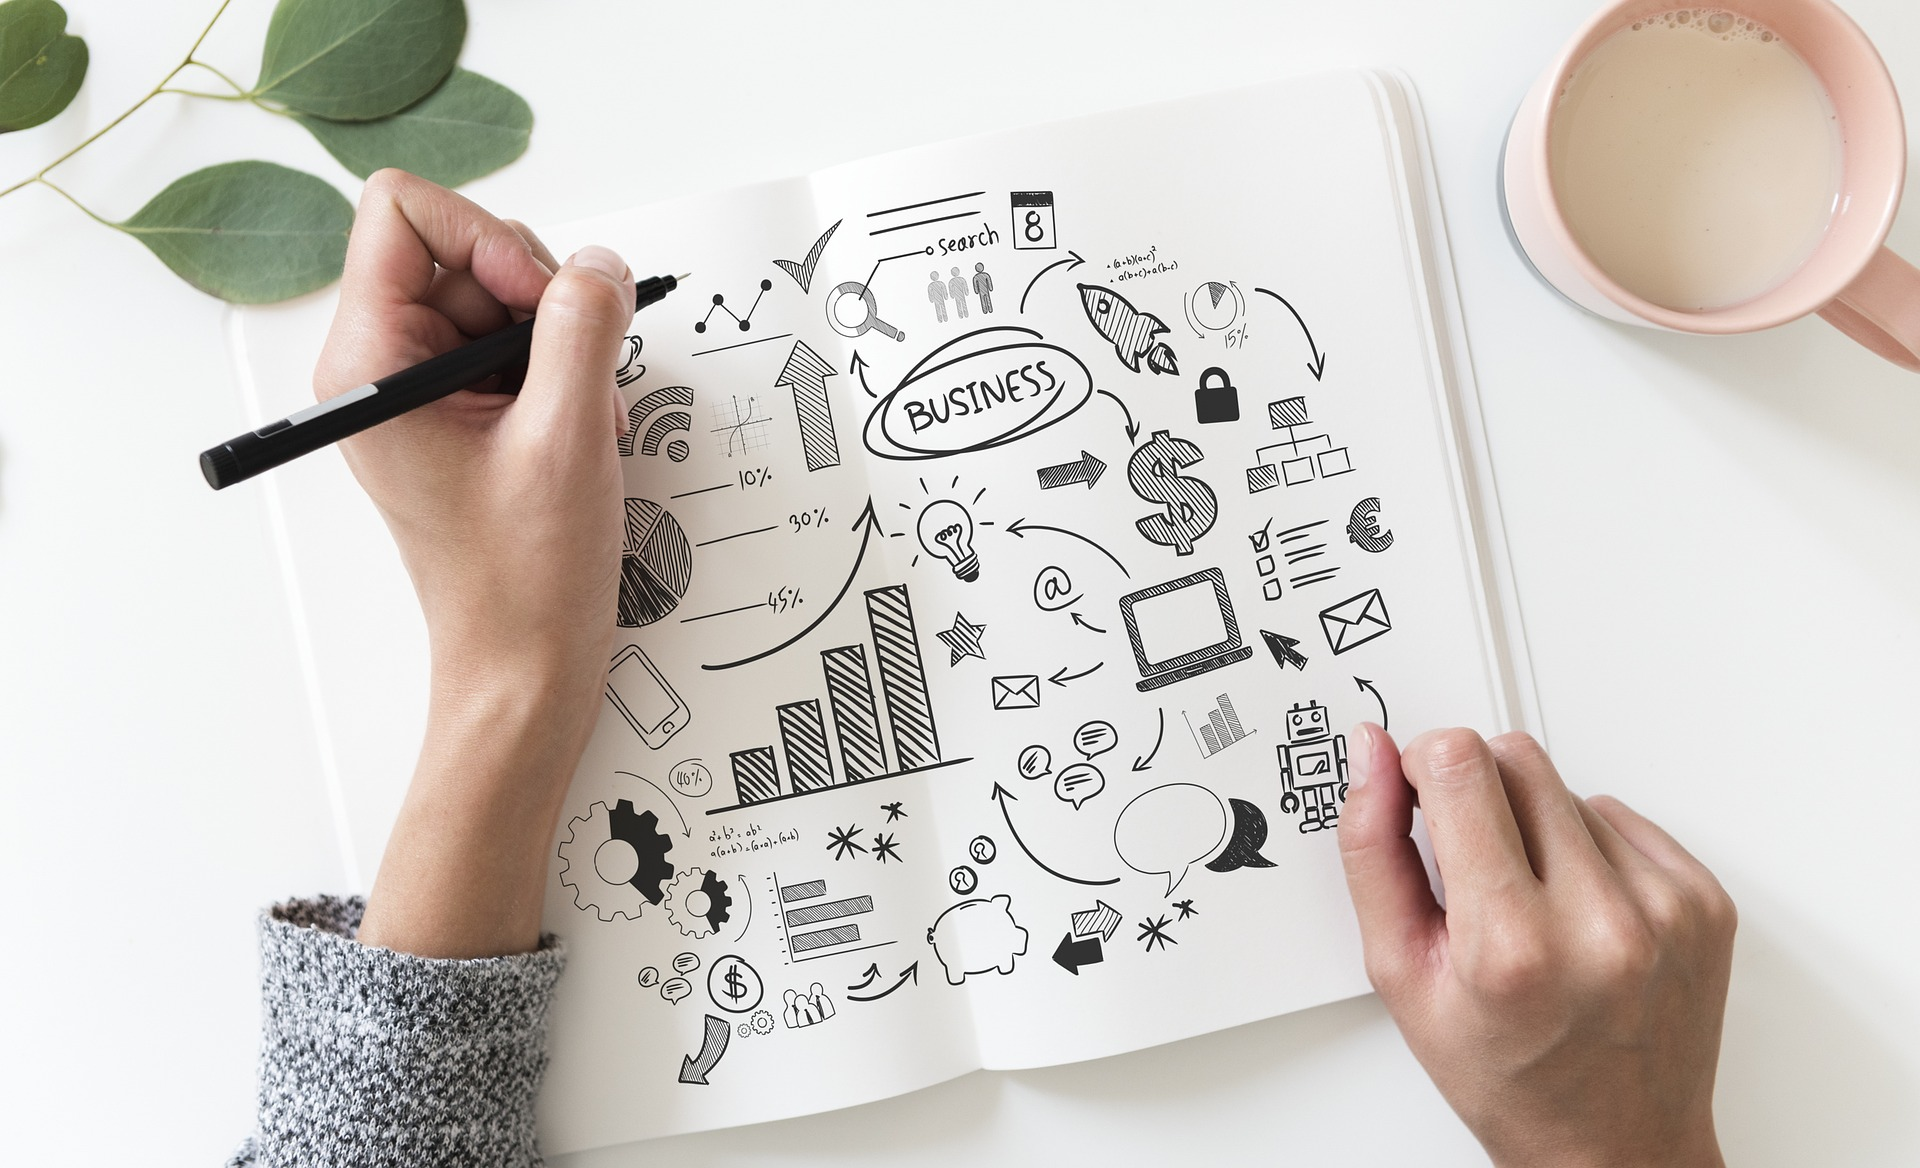 B2B Lead Generation Strategies That Work